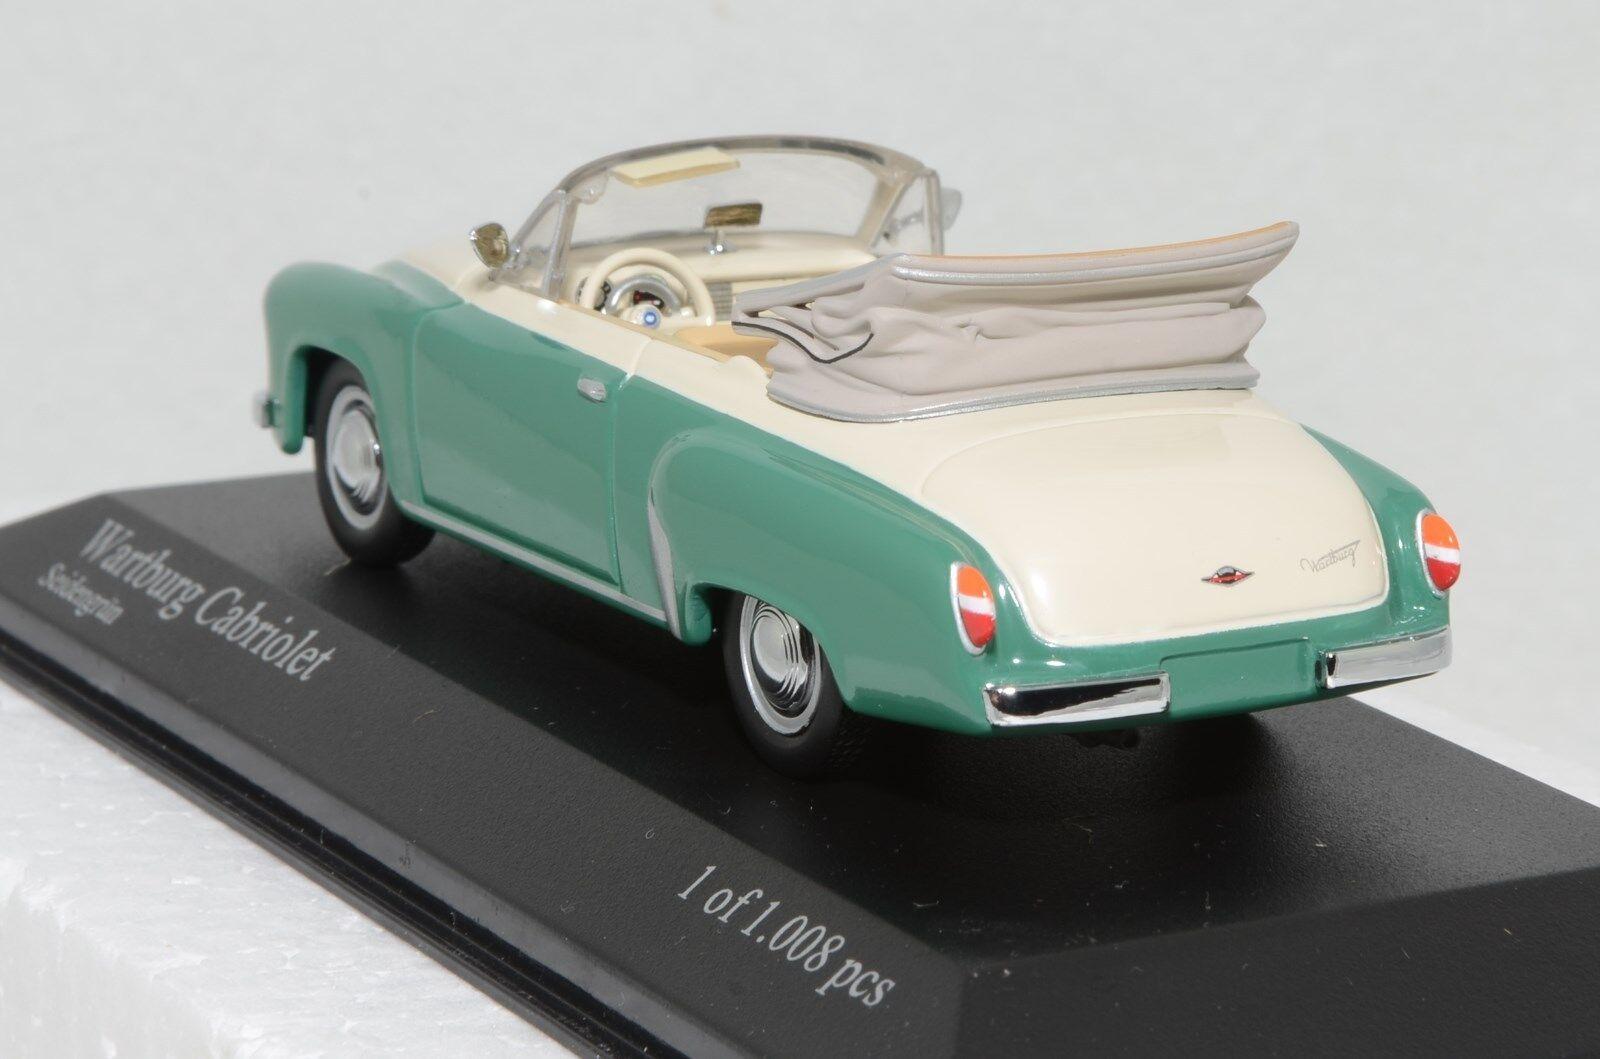 1 43 Minichamps 430 015934 015934 015934 Wartburg 312 cabriolet 1958 cream green MIB 4d059d